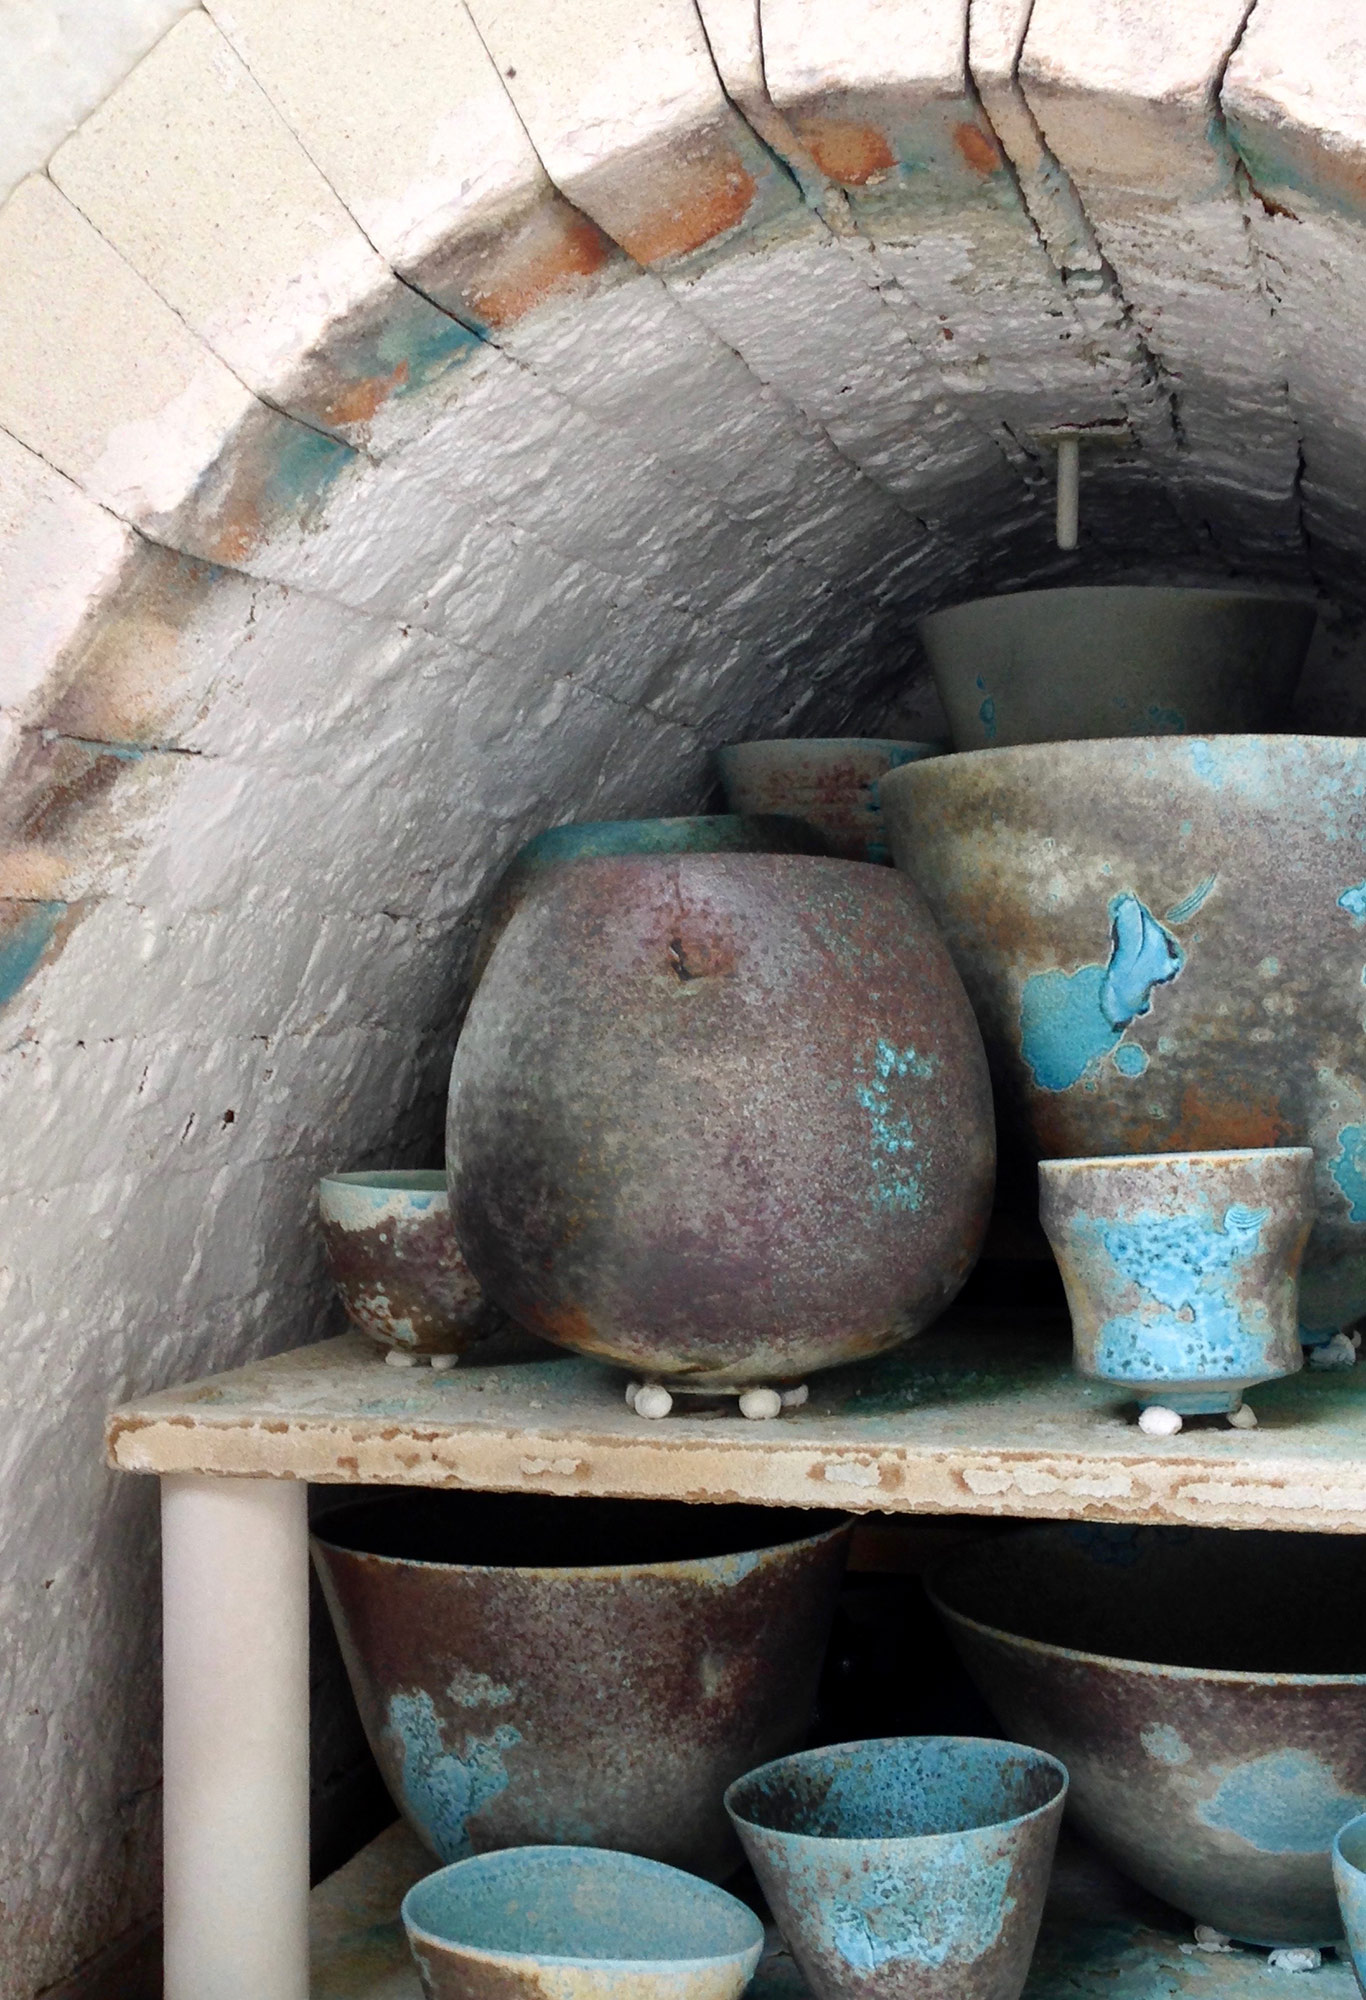 doherty-porcelain-new-studio-soda-03.jpg